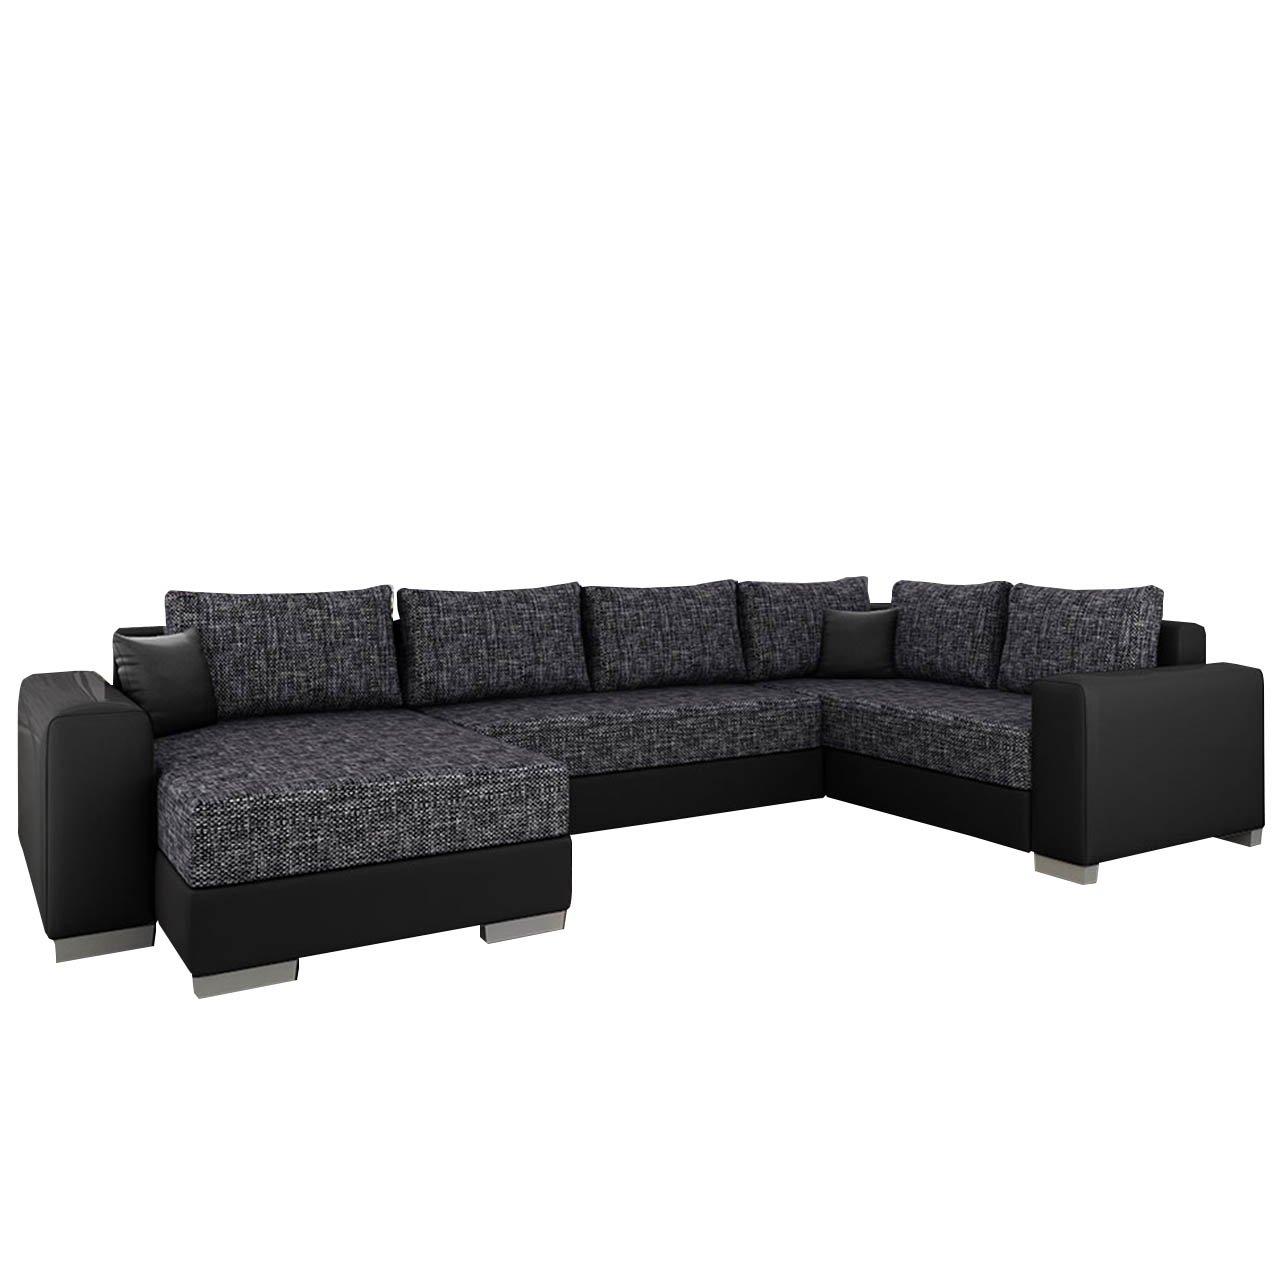 Ecksofa Olga, Elegante BIG Couch, Design U-Form Eckcouch, Ecksofa, Farbauswahl, Wohnlandschaft (Ecksofa Links, Soft 011 + Valencia 101)